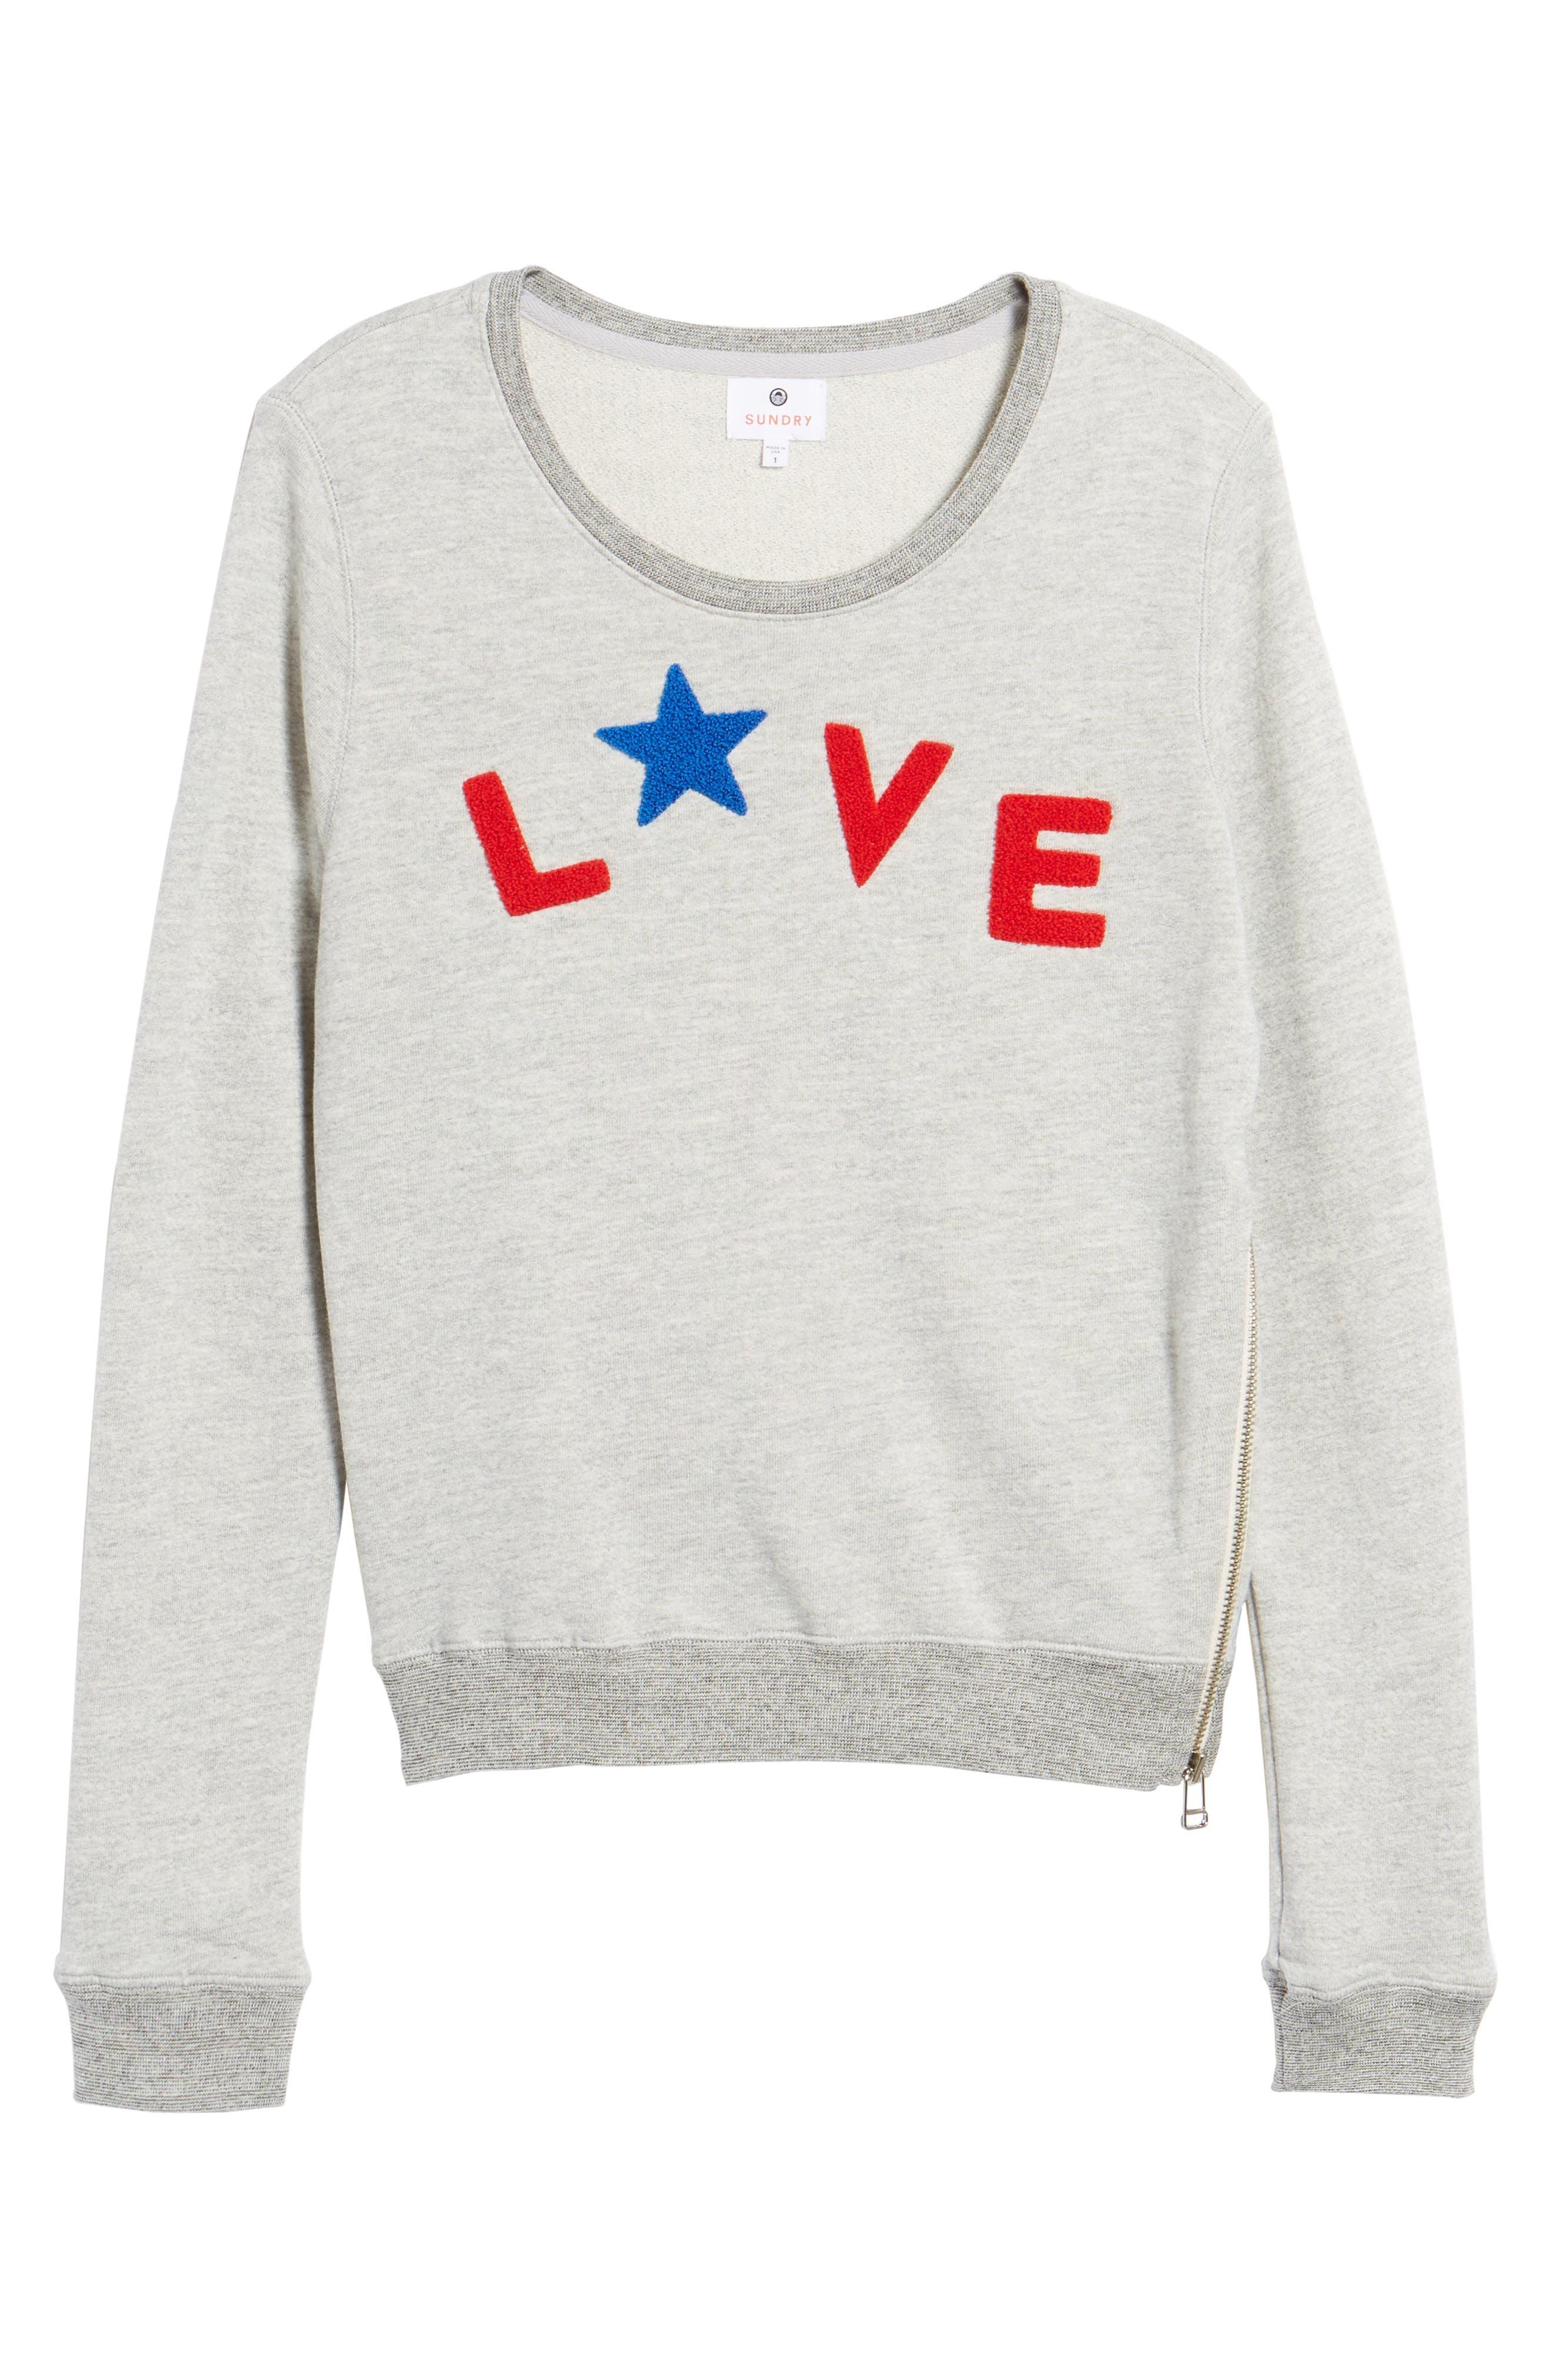 Love Sweatshirt,                             Alternate thumbnail 6, color,                             Heather Grey